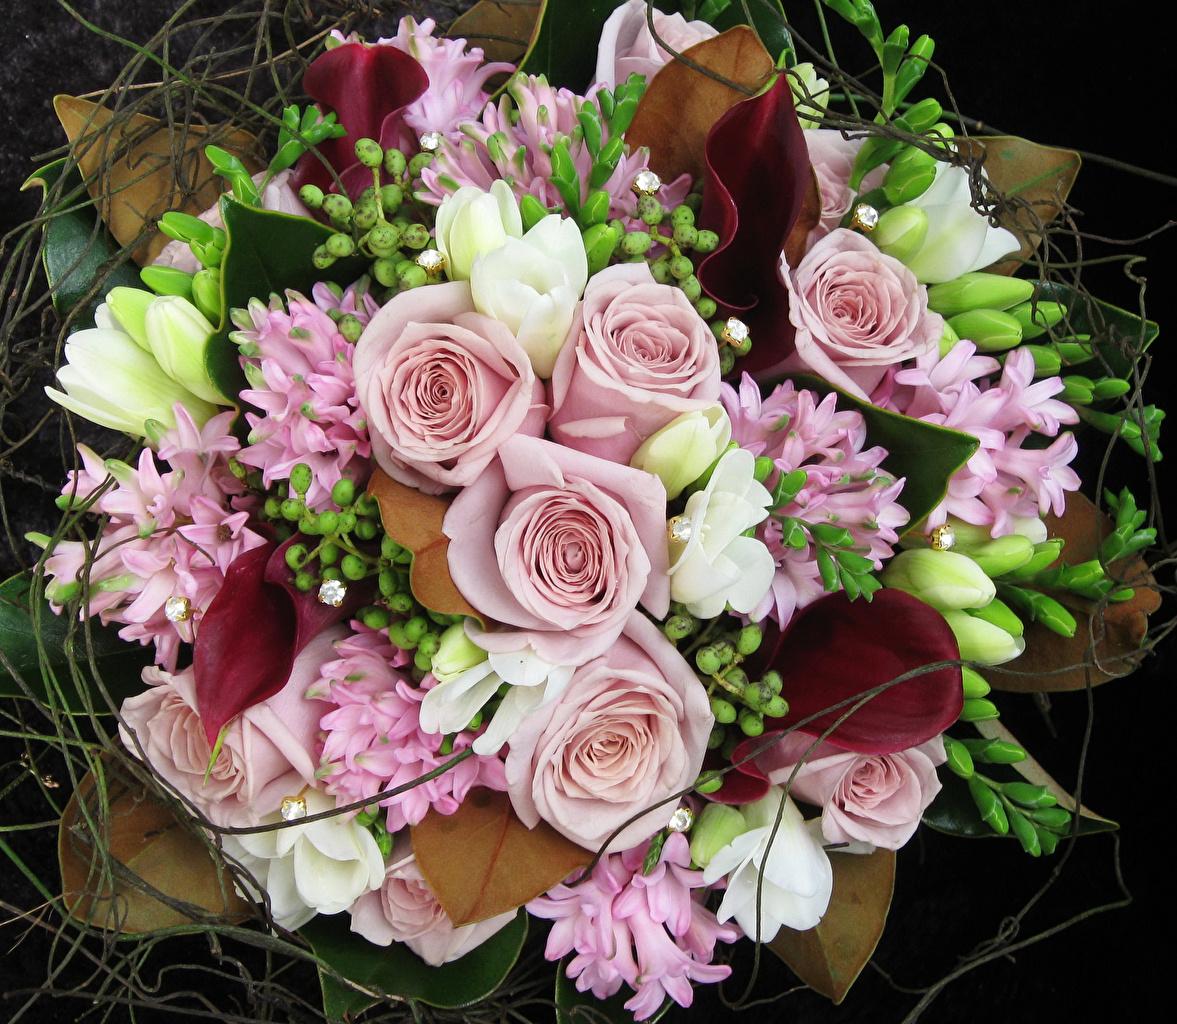 Фотография Букеты Розы белокрыльник Цветы Фрезия Гиацинты букет роза Каллы цветок